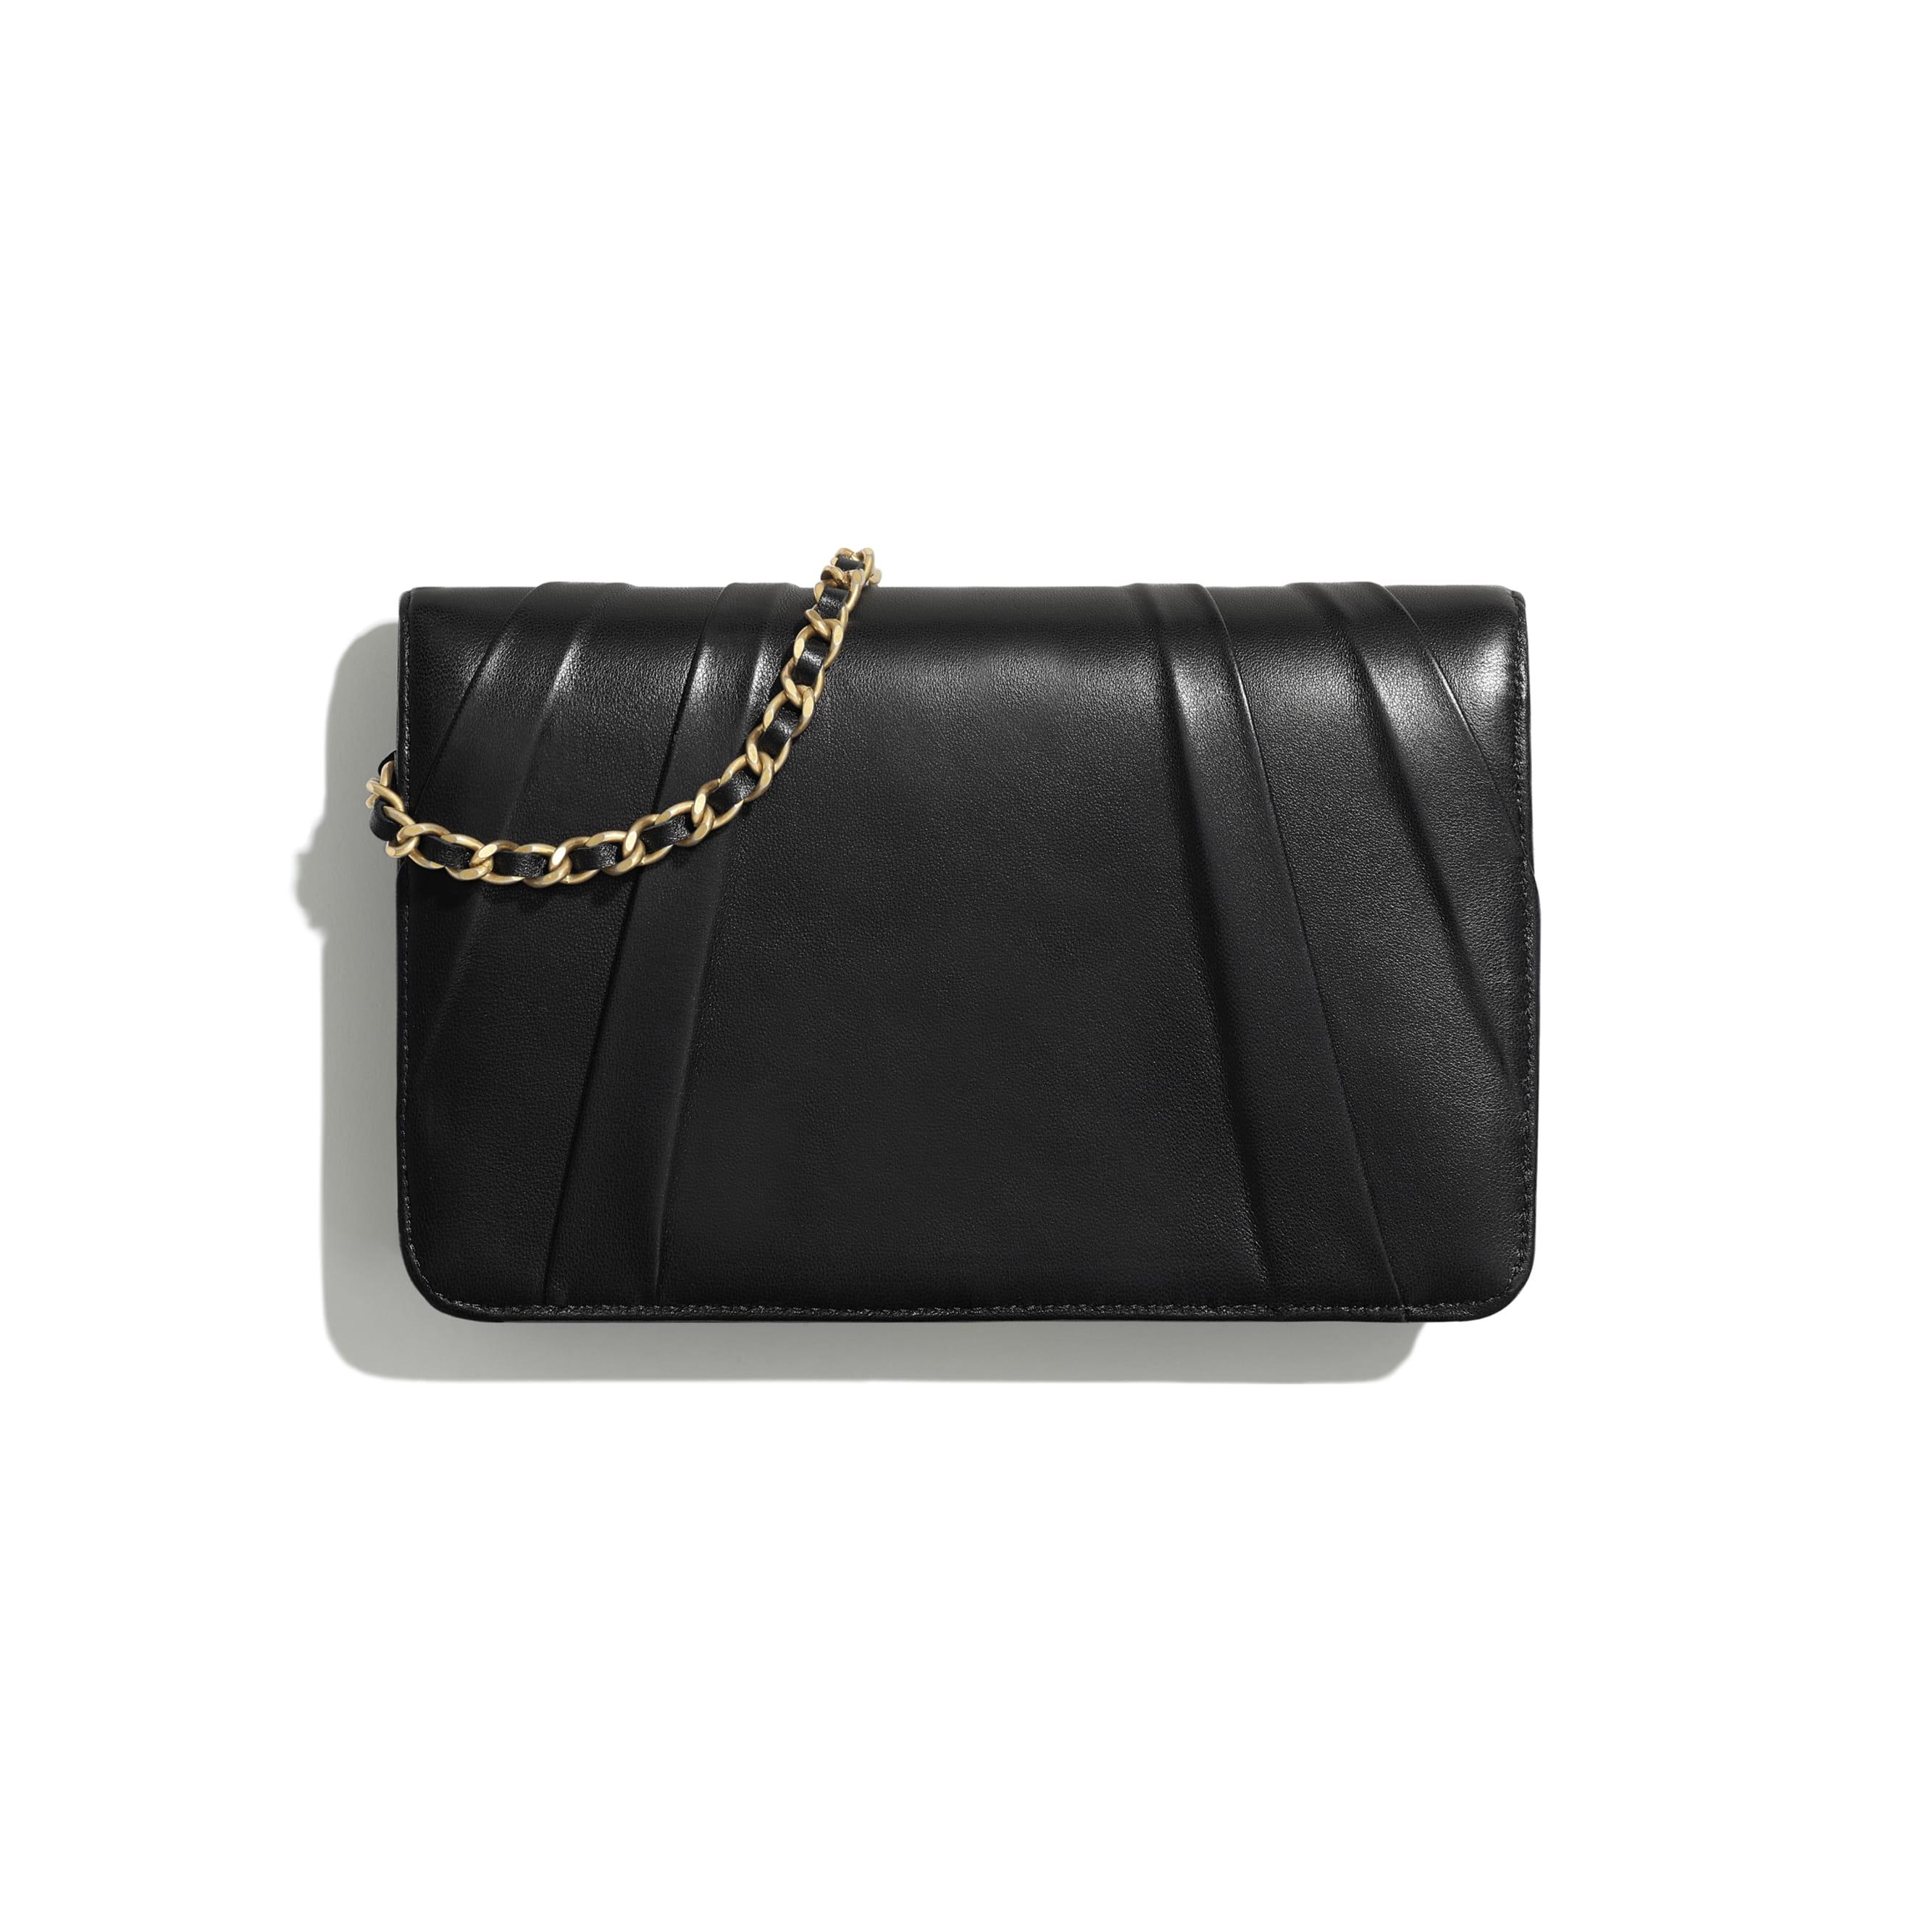 Wallet on Chain - Black - Pleated Lambskin & Gold-Tone Metal - Alternative view - see standard sized version